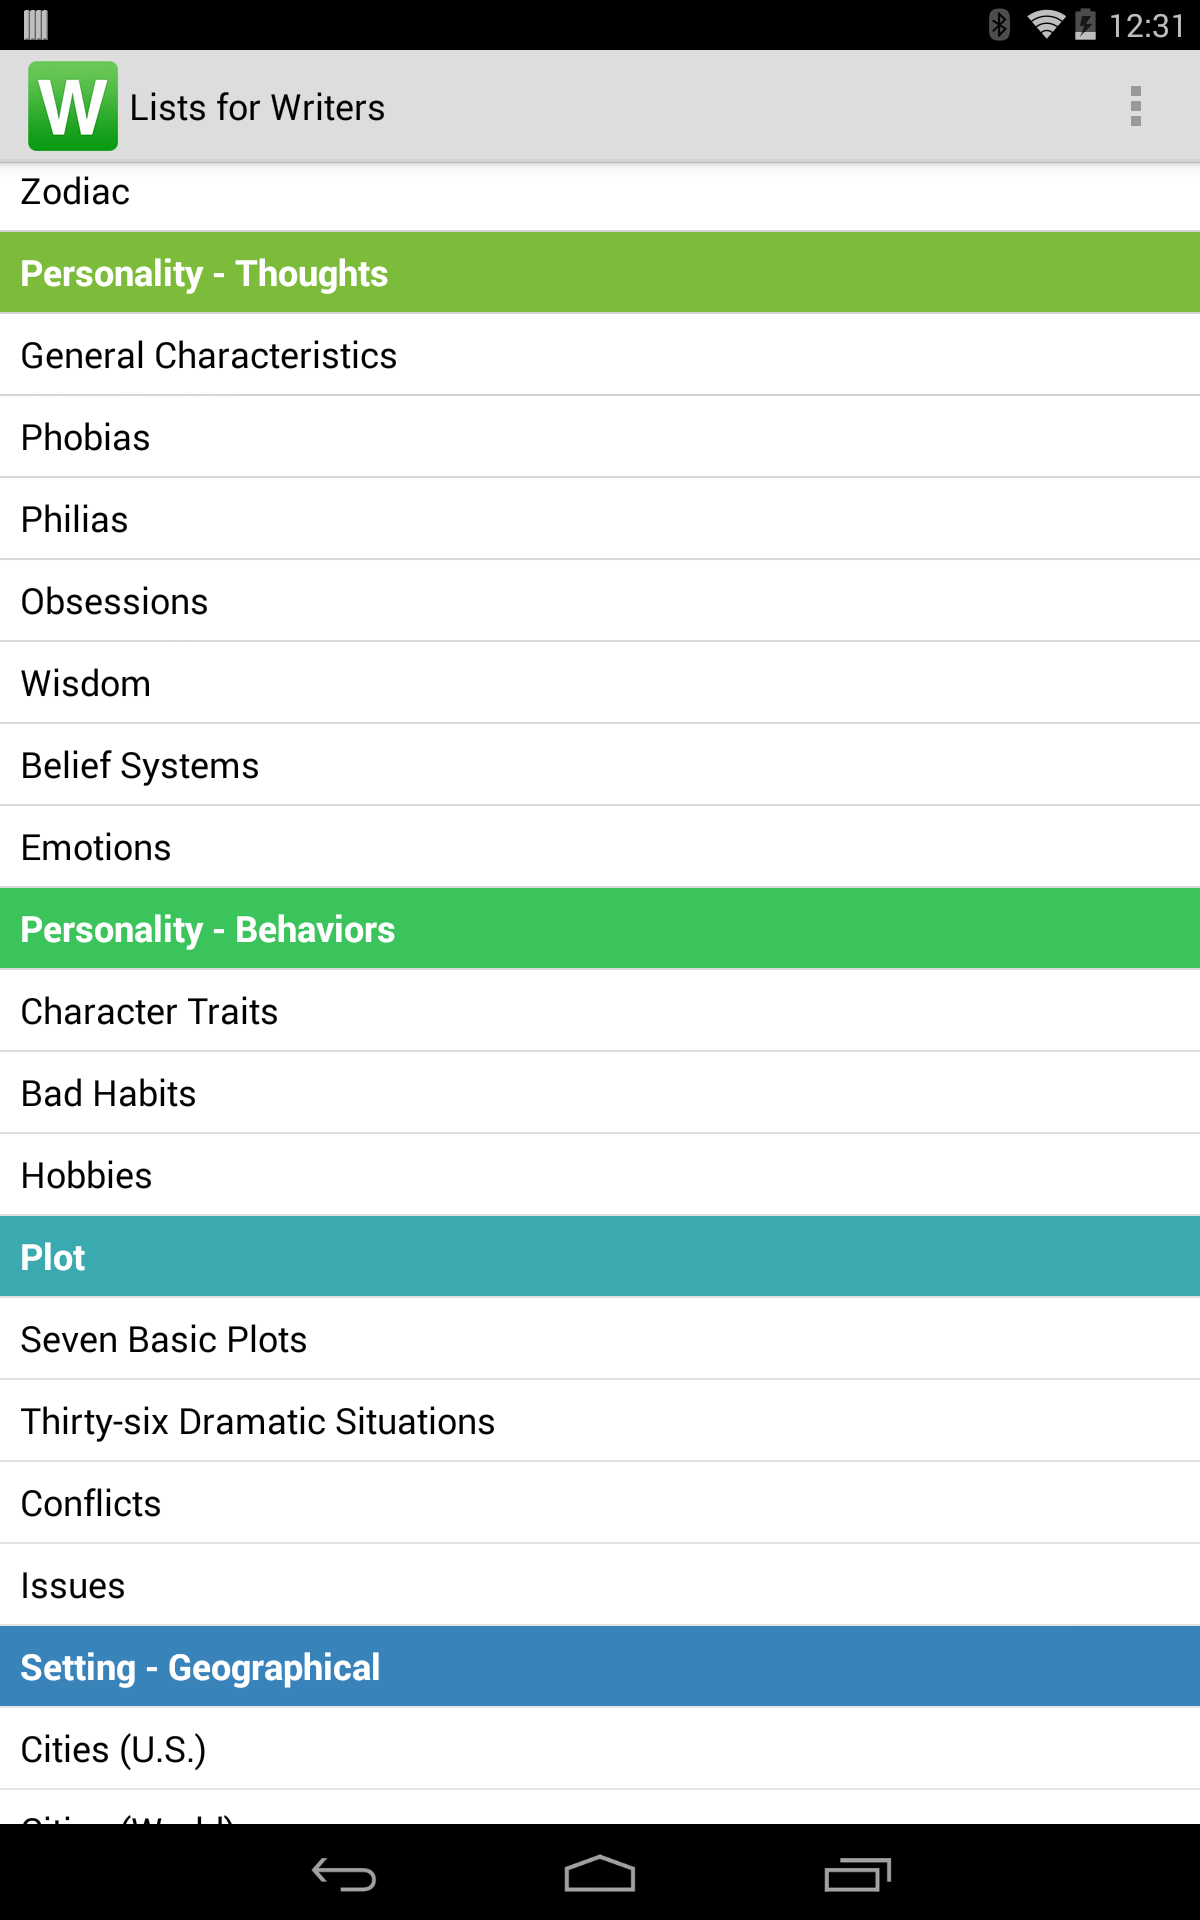 Lists for Writers screenshot #11